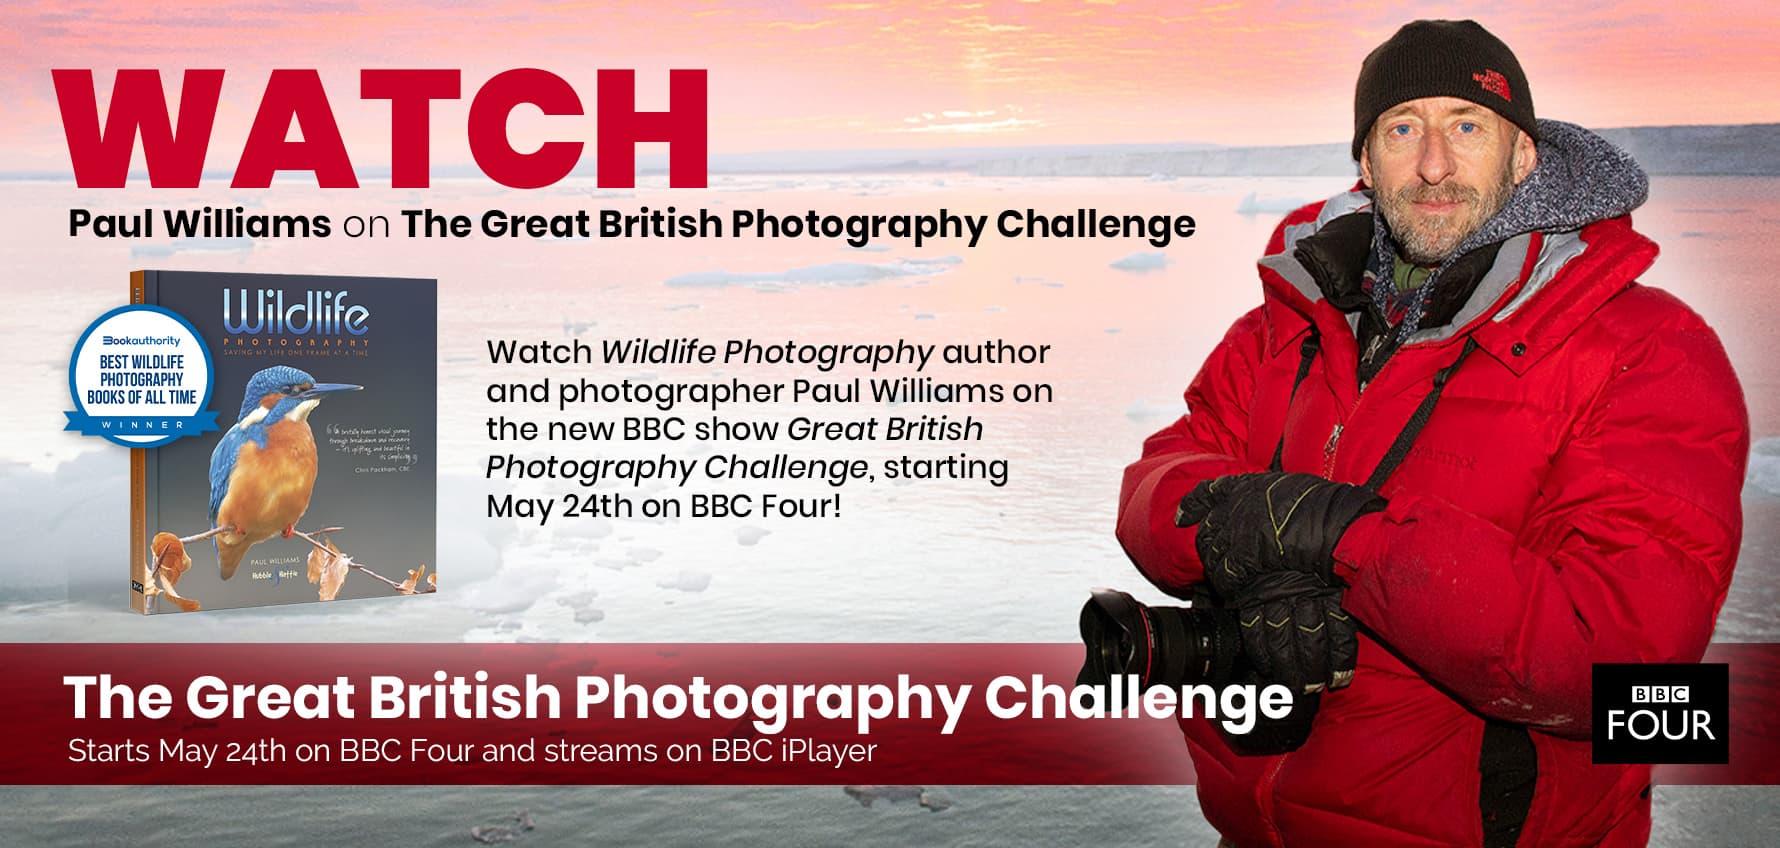 Watch Paul Williams on BBC Four